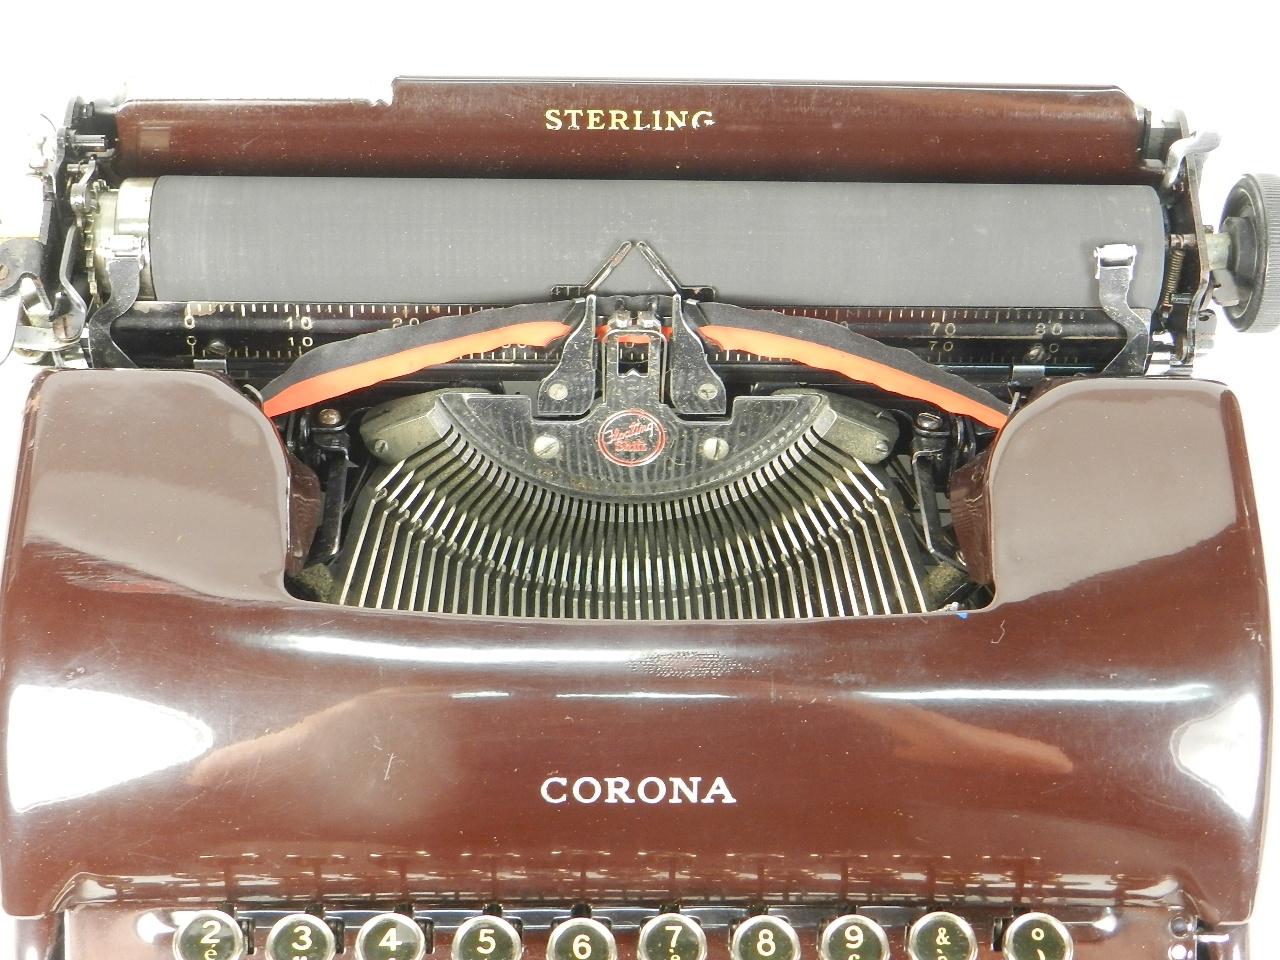 Imagen CORONA STERLING  30530